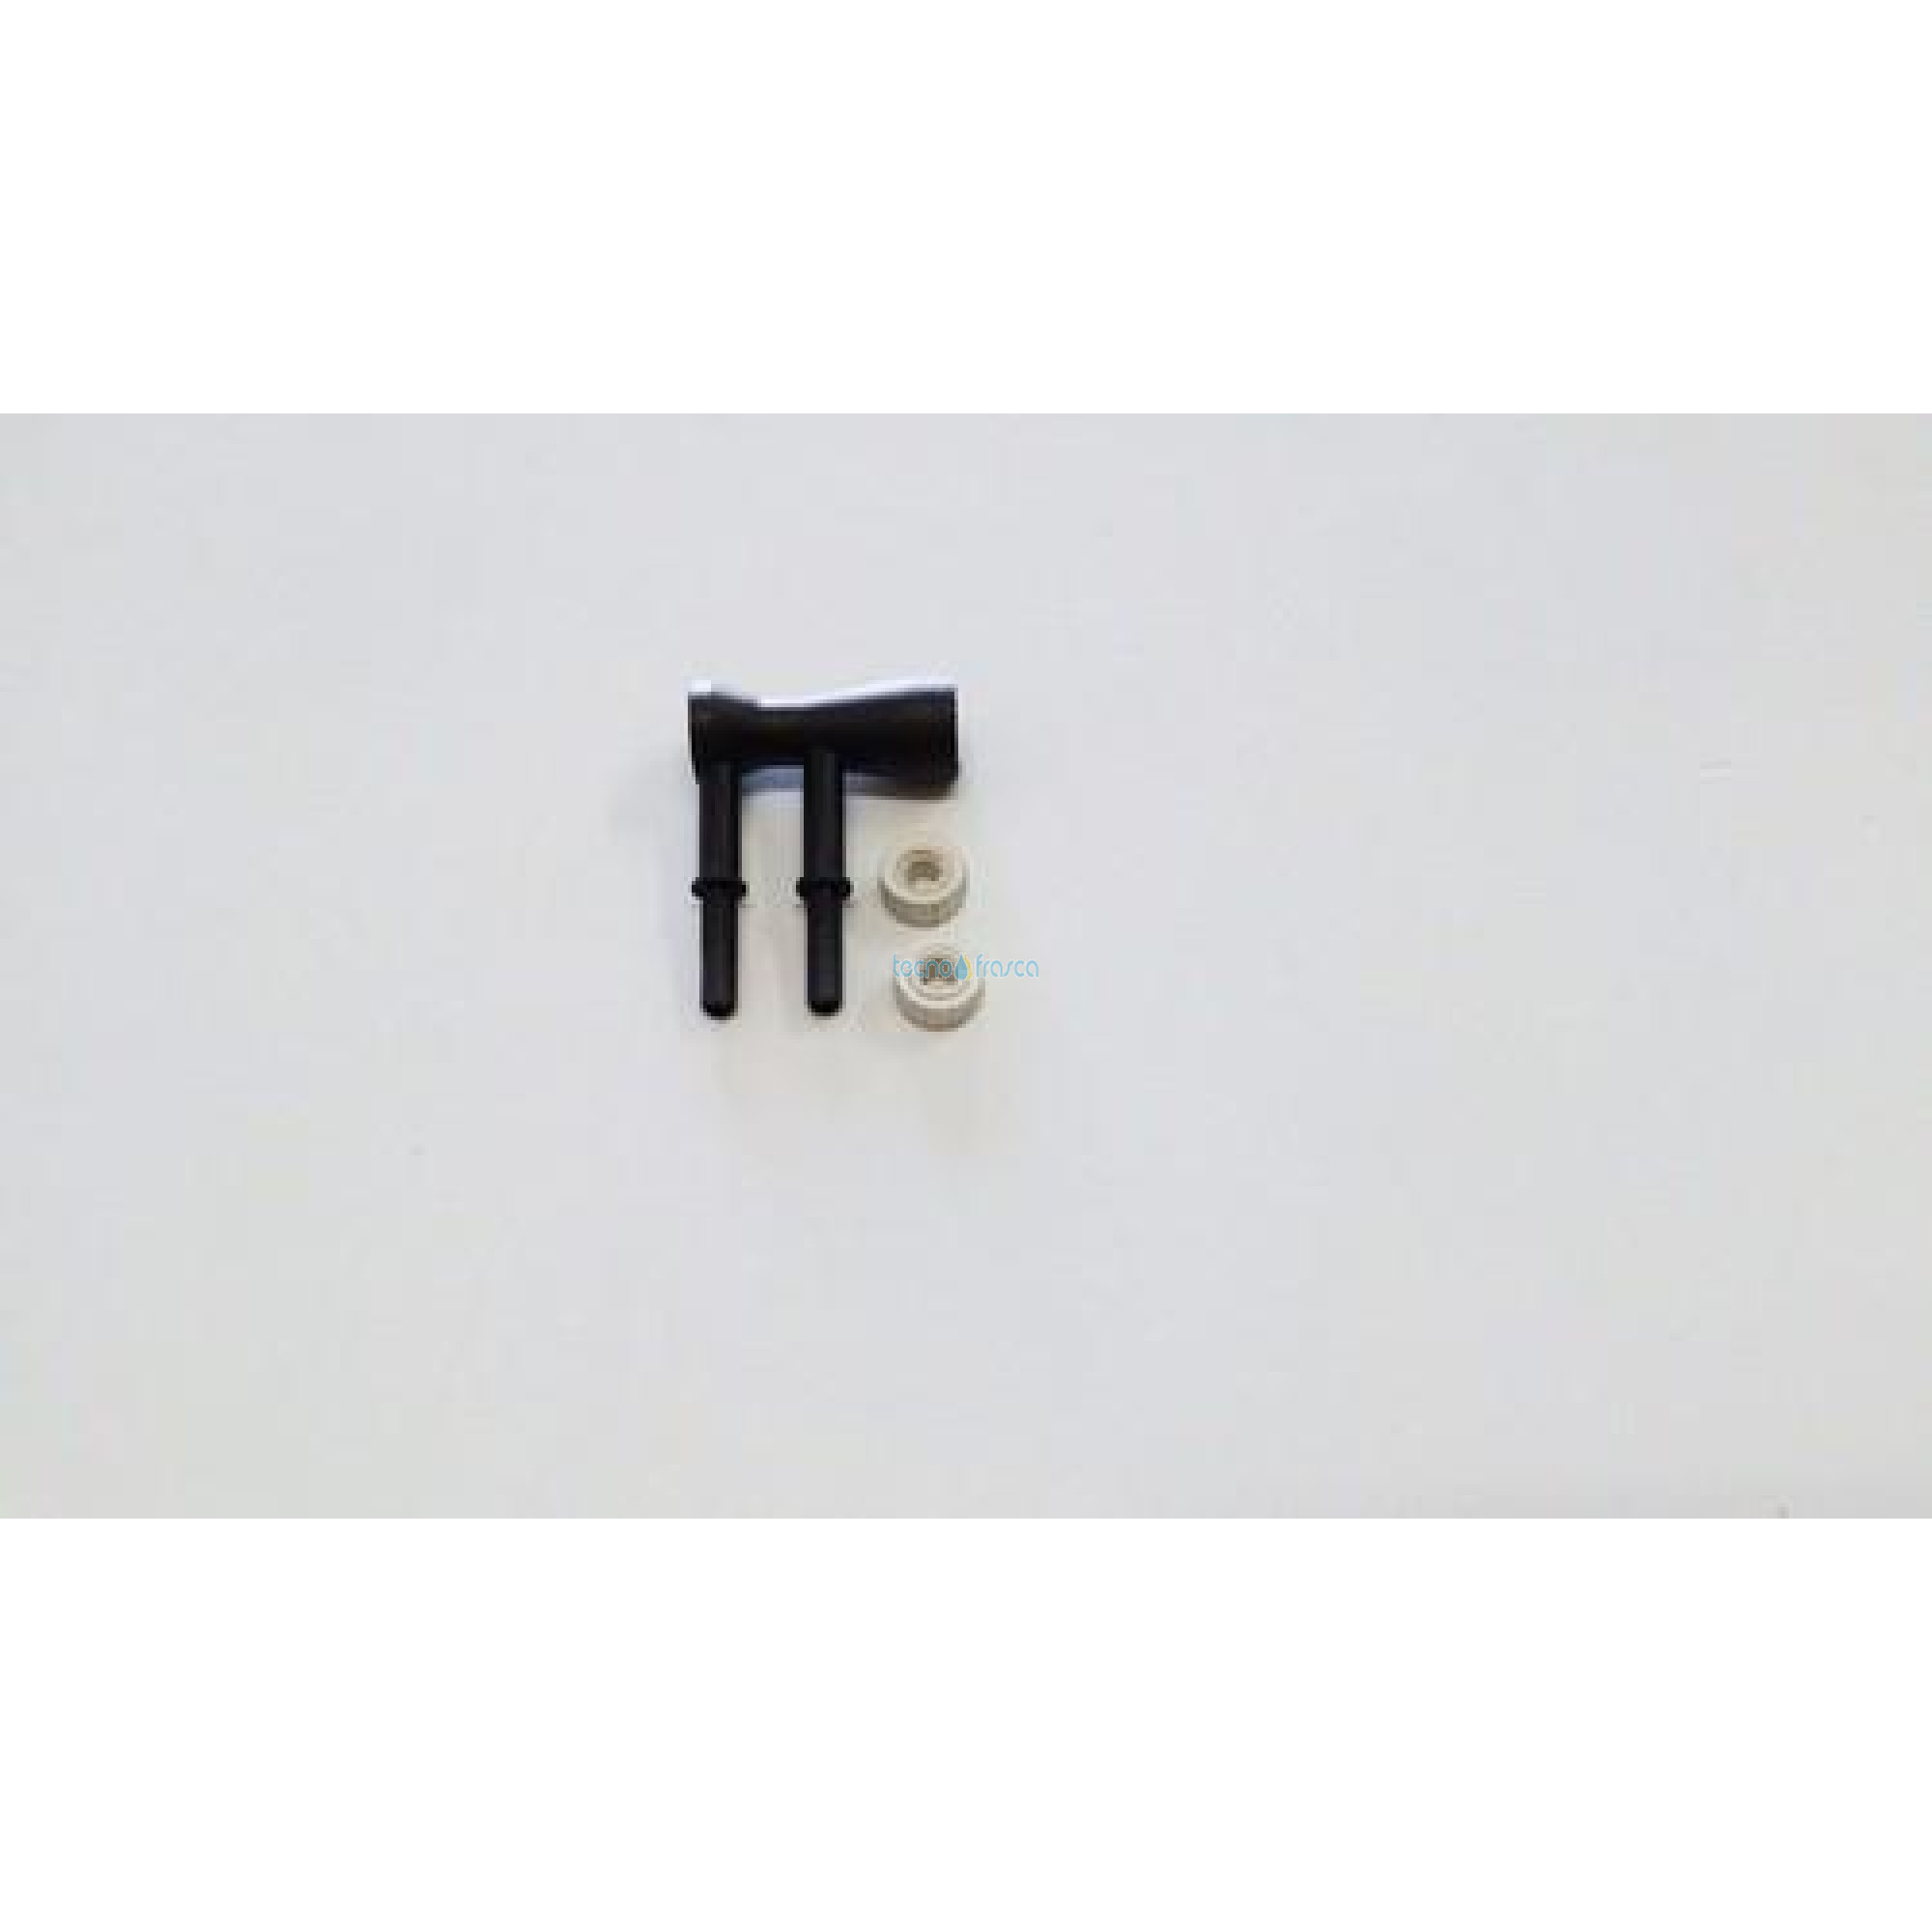 Unical kit venturi pps 95262023